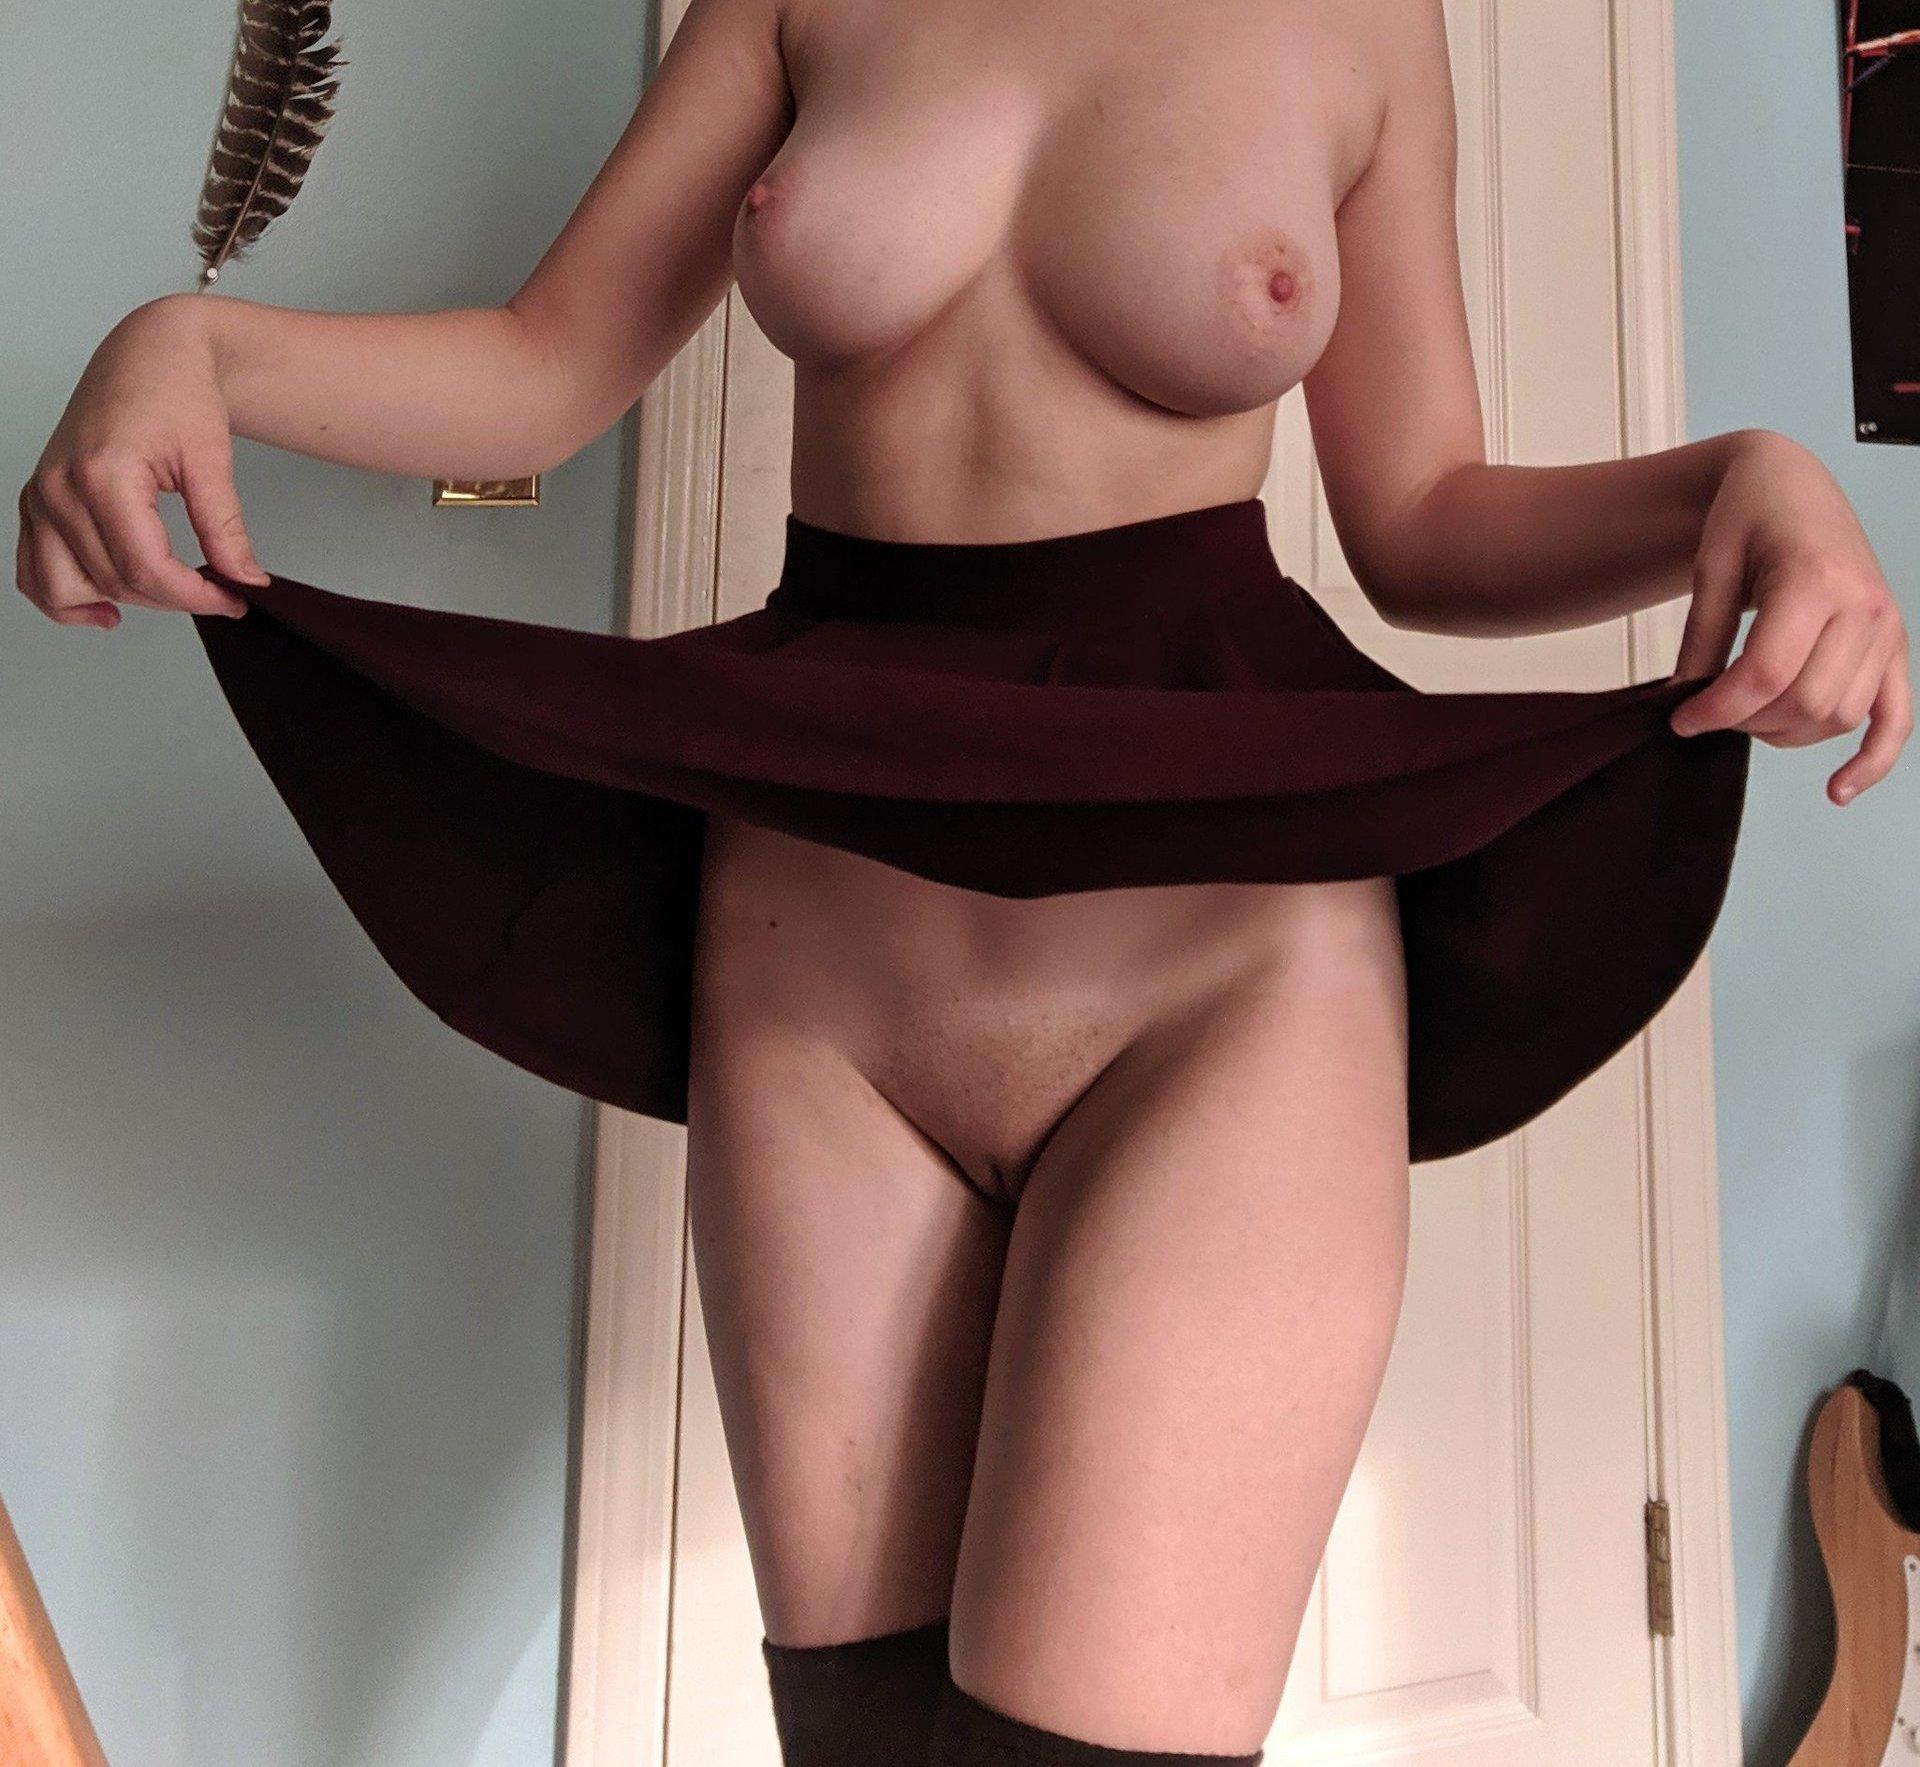 Sendeyed Others Nude Leaks 0009